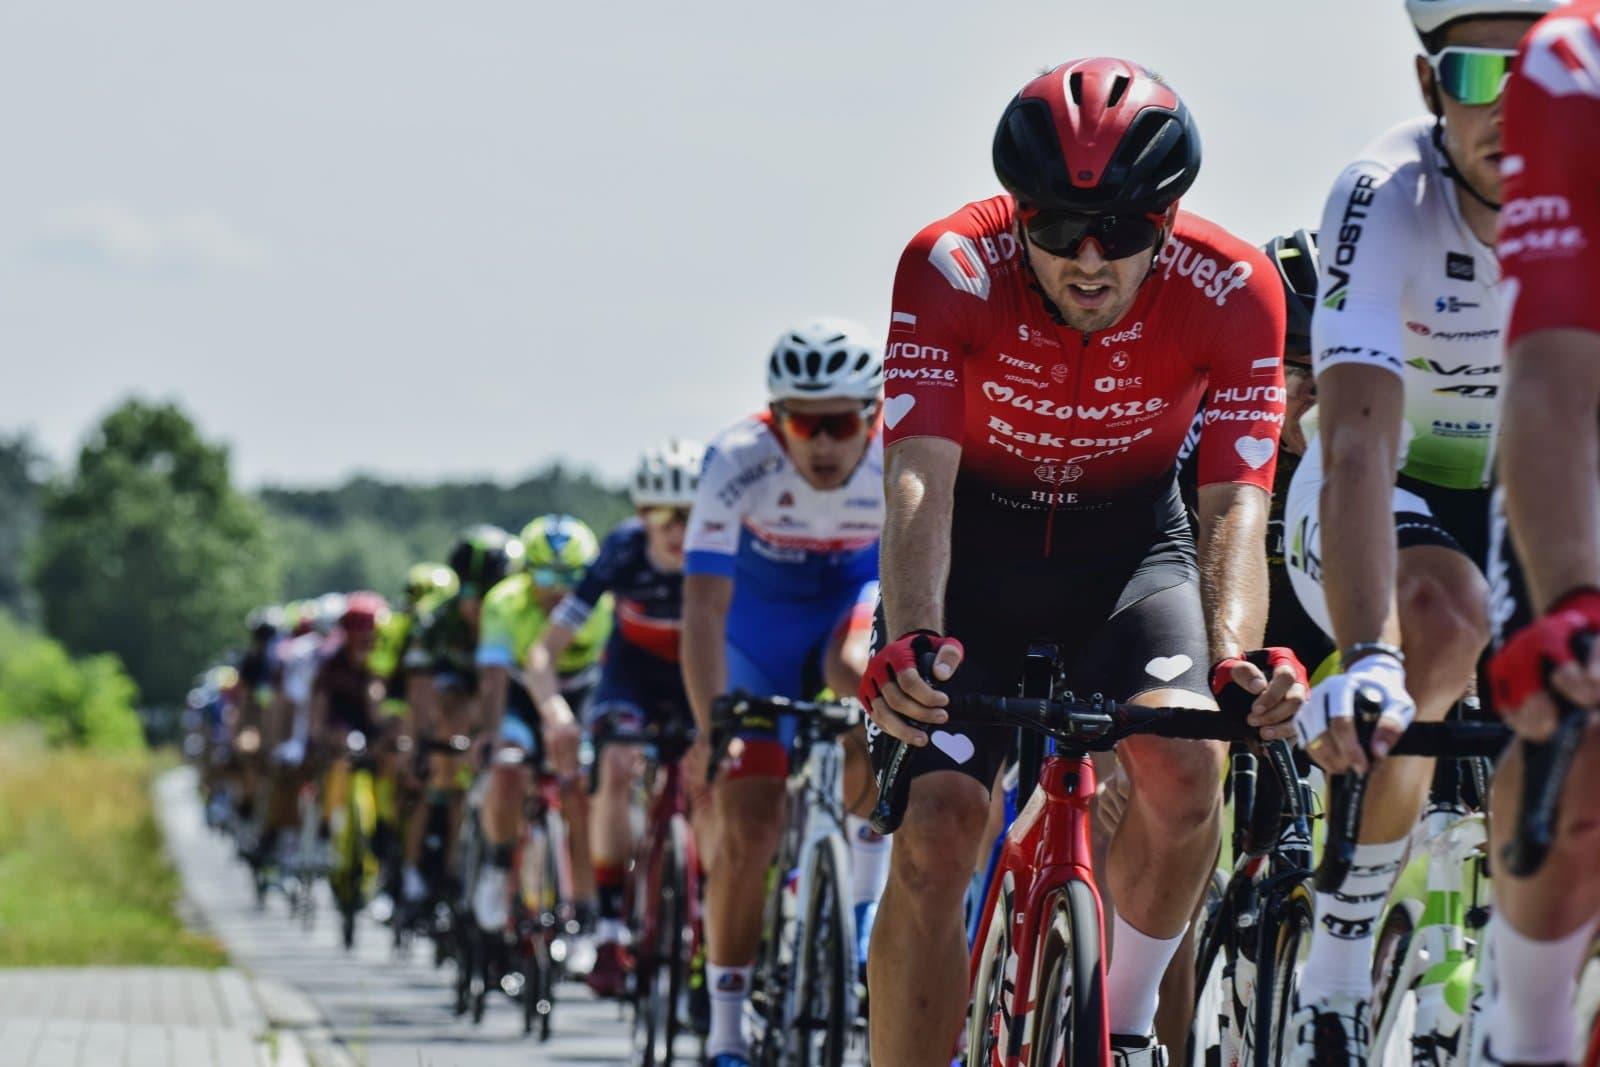 Visegrad 4 Bicycle Race-Grand Prix Polski dla Itamara Einhorna